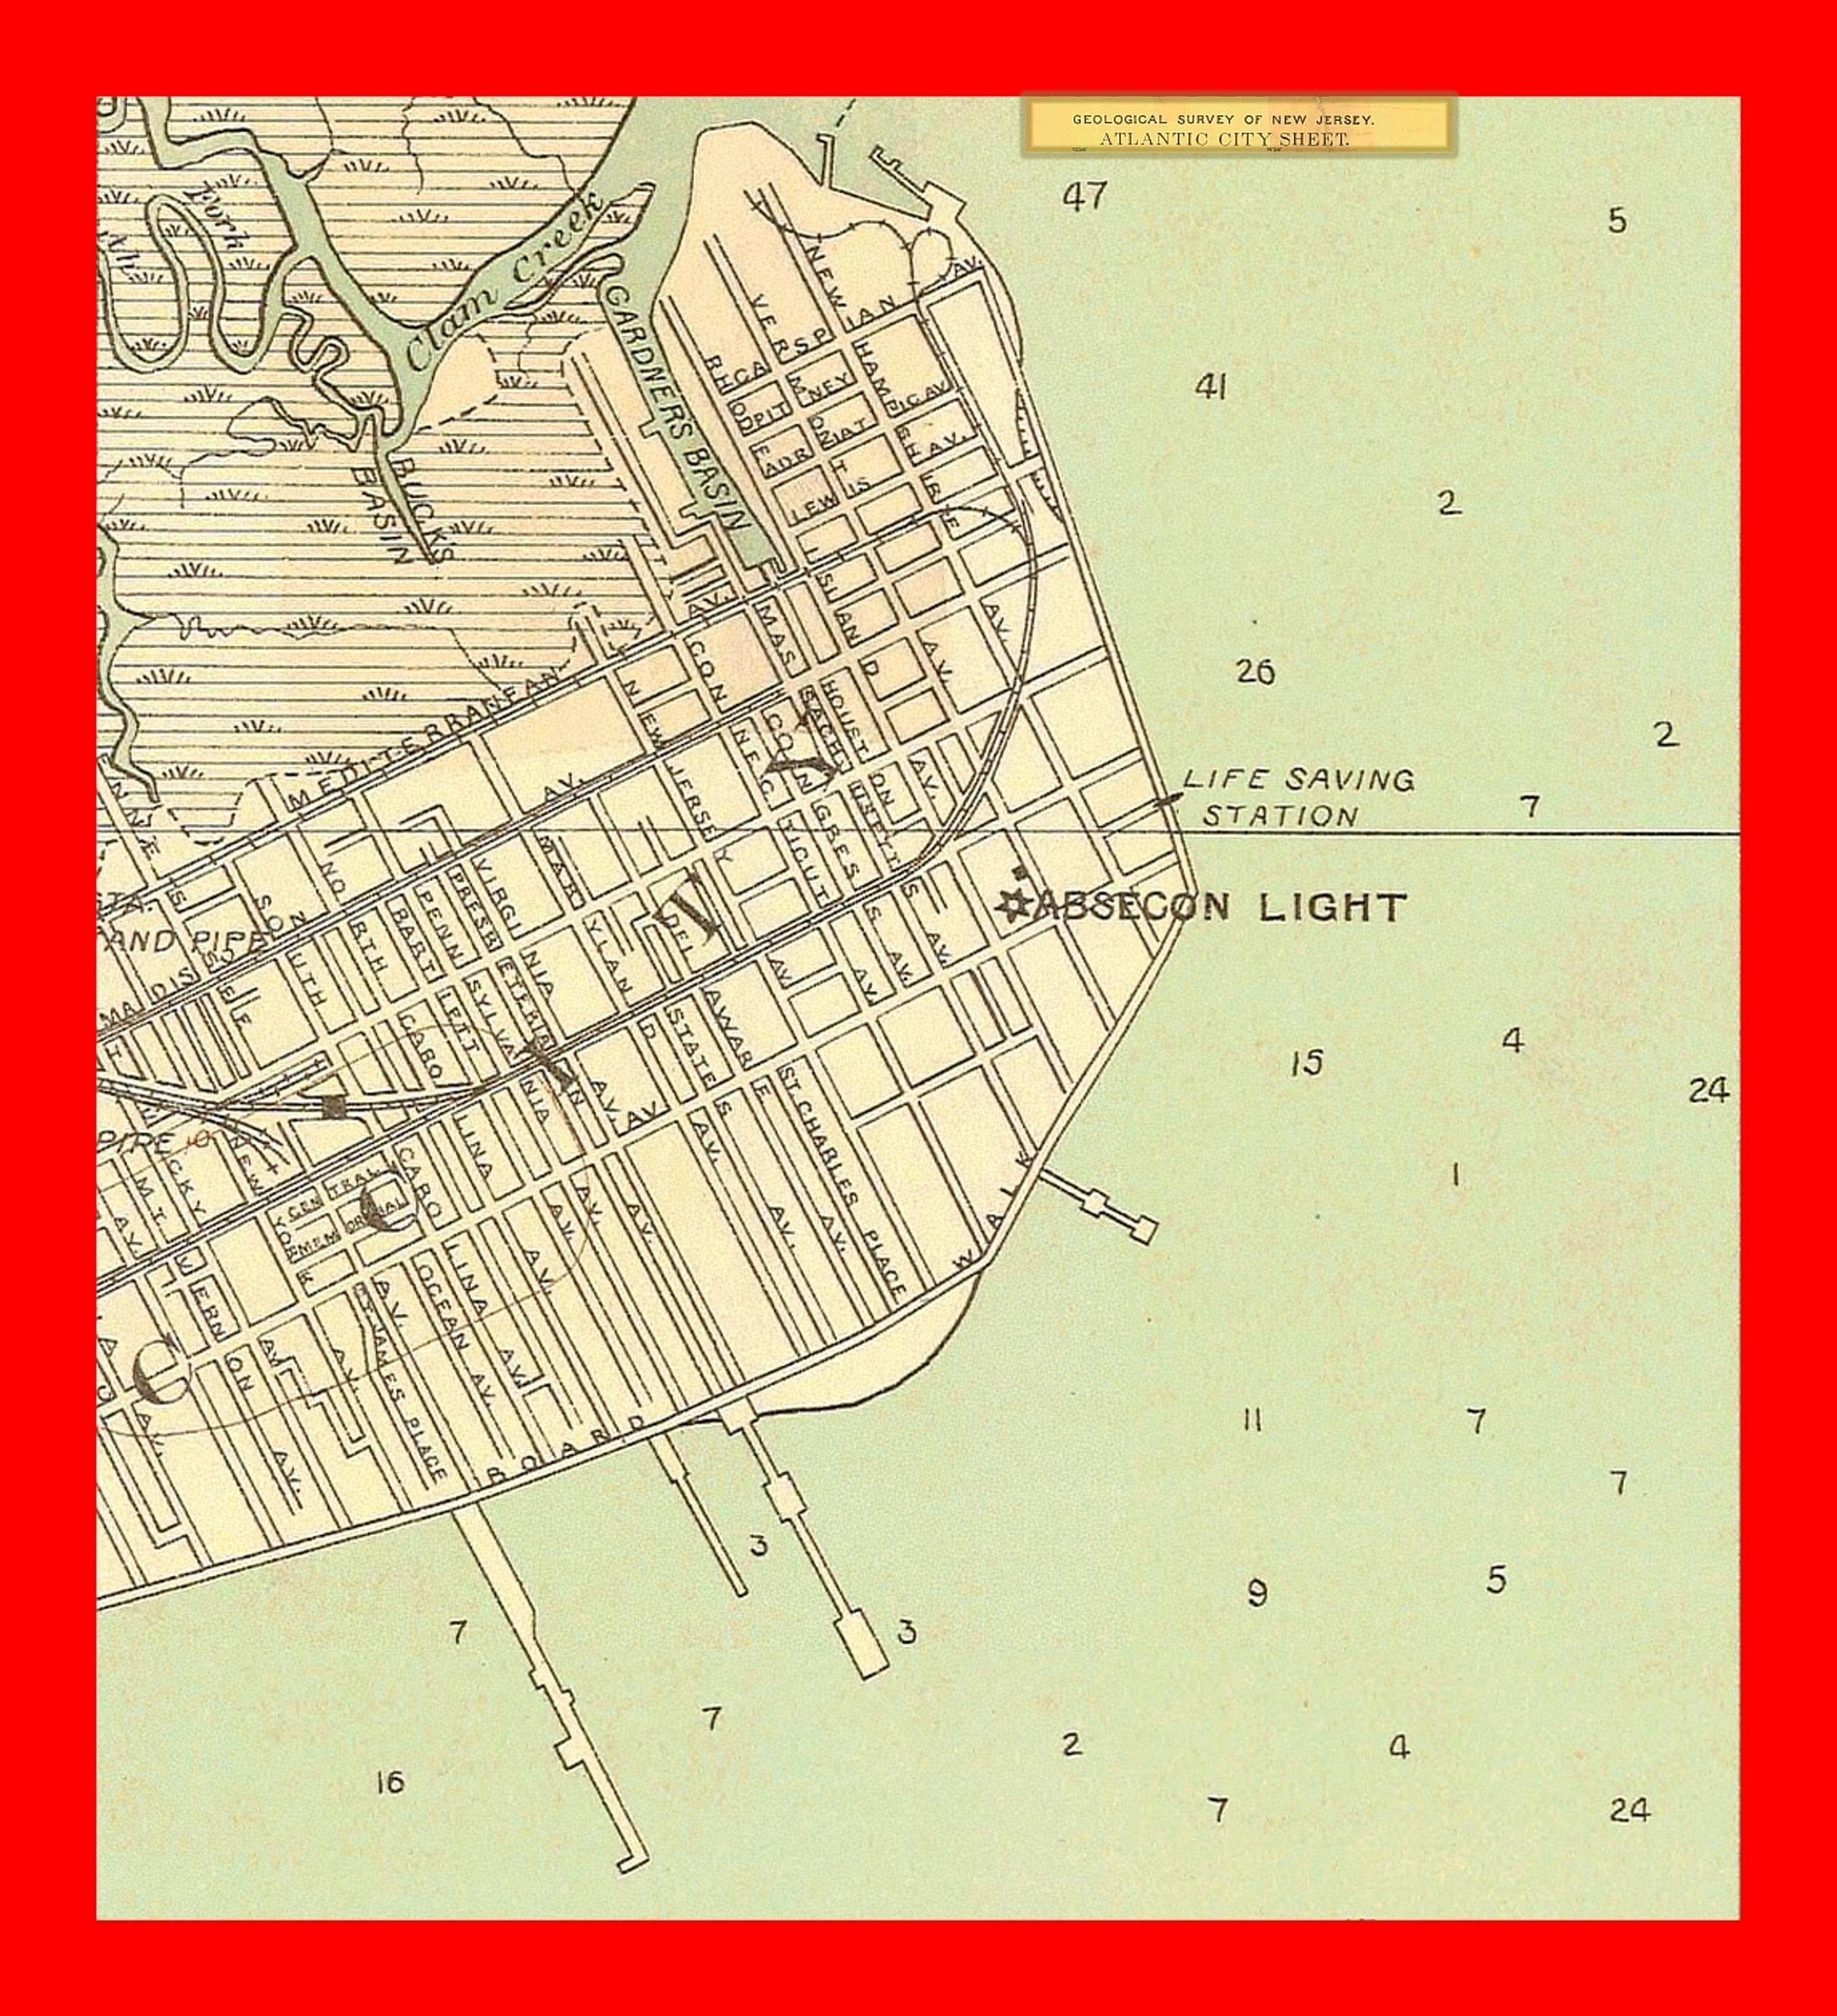 Atlantic City Map Printable